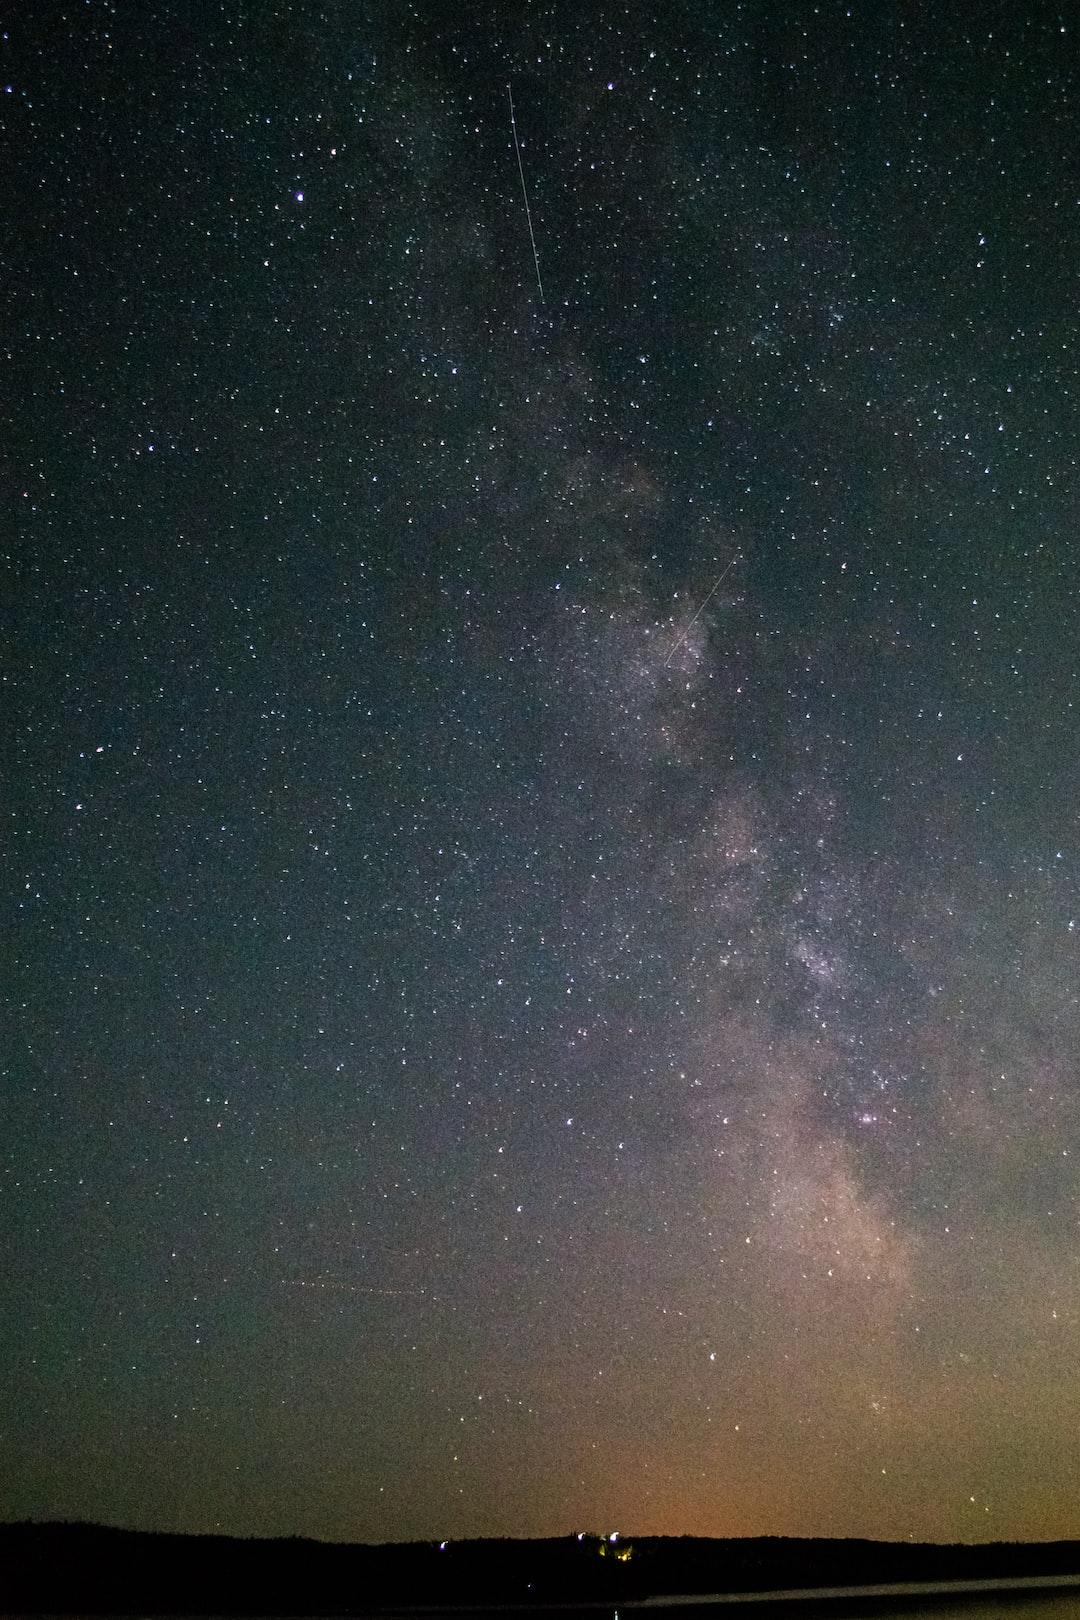 Shot of The Milky Way from Cape Breton, Nova Scotia, Canada